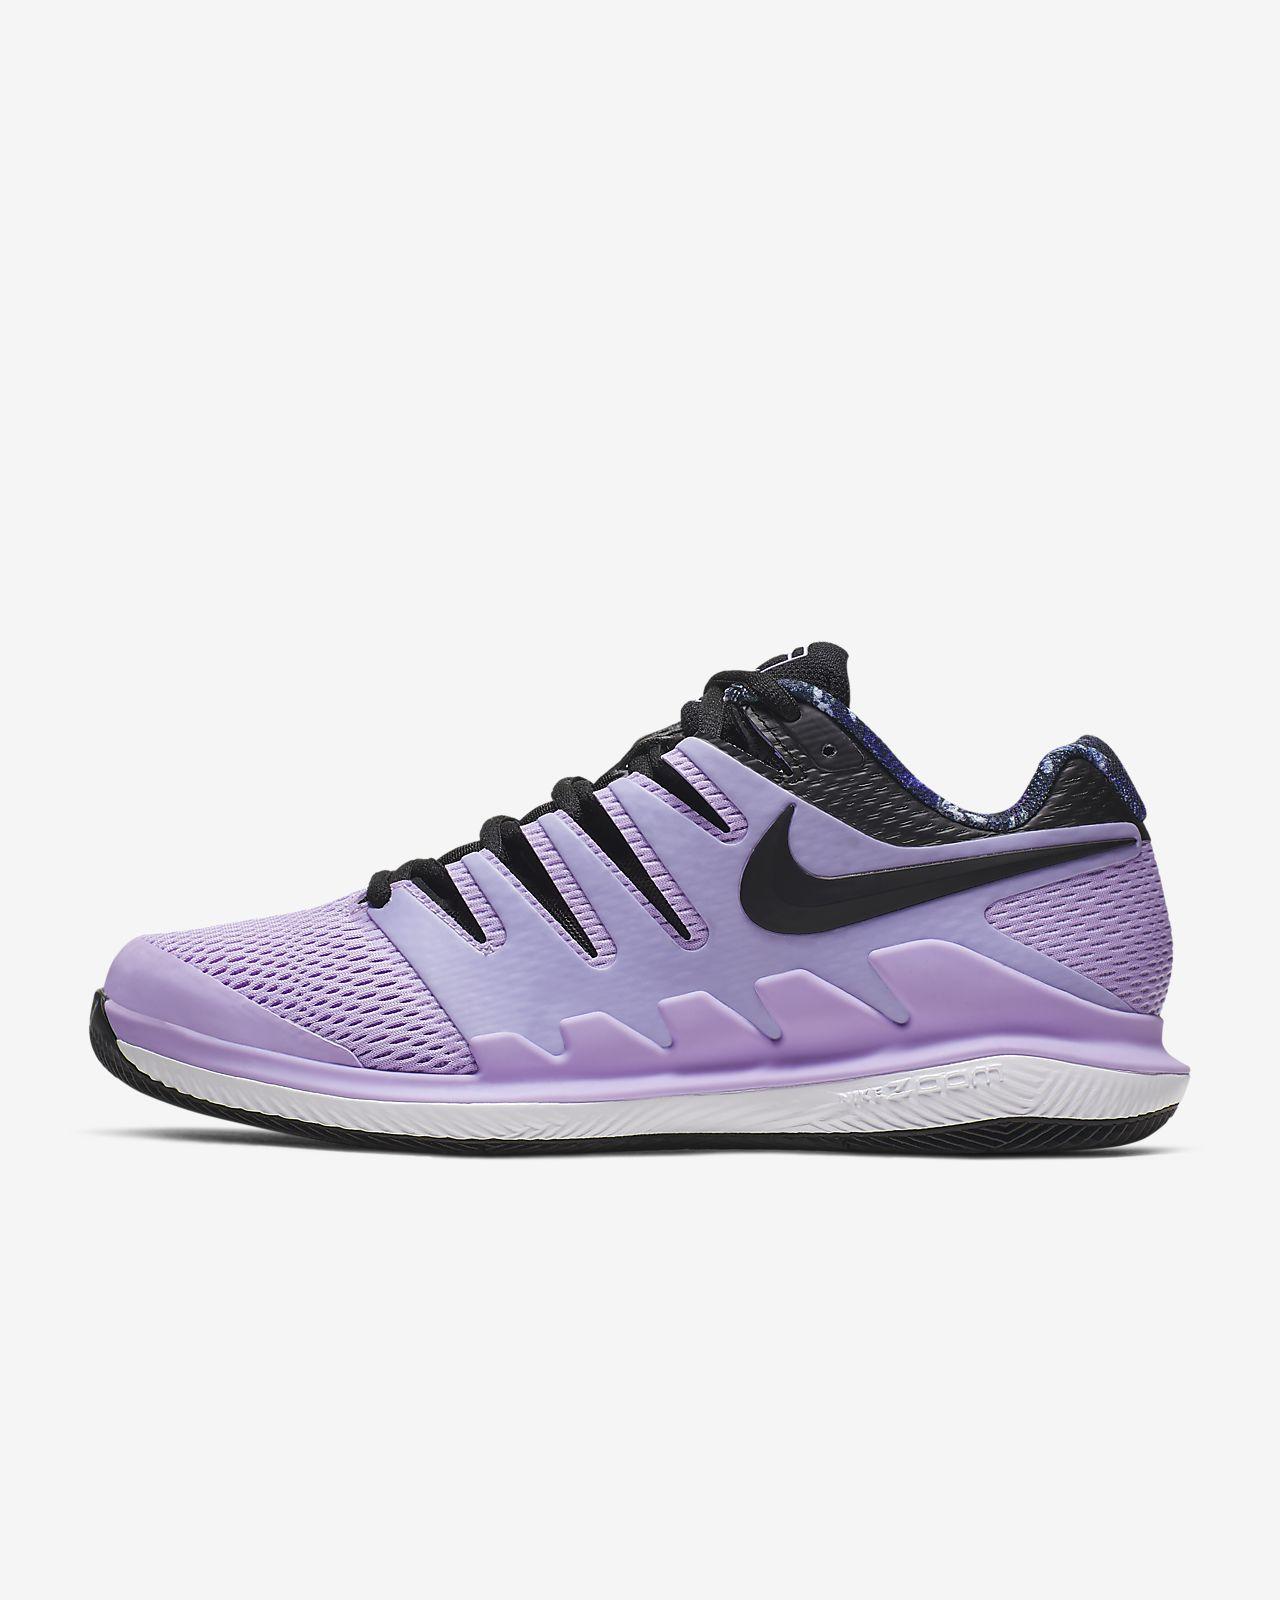 Scarpa da tennis per campi in cemento NikeCourt Air Zoom Vapor X - Donna